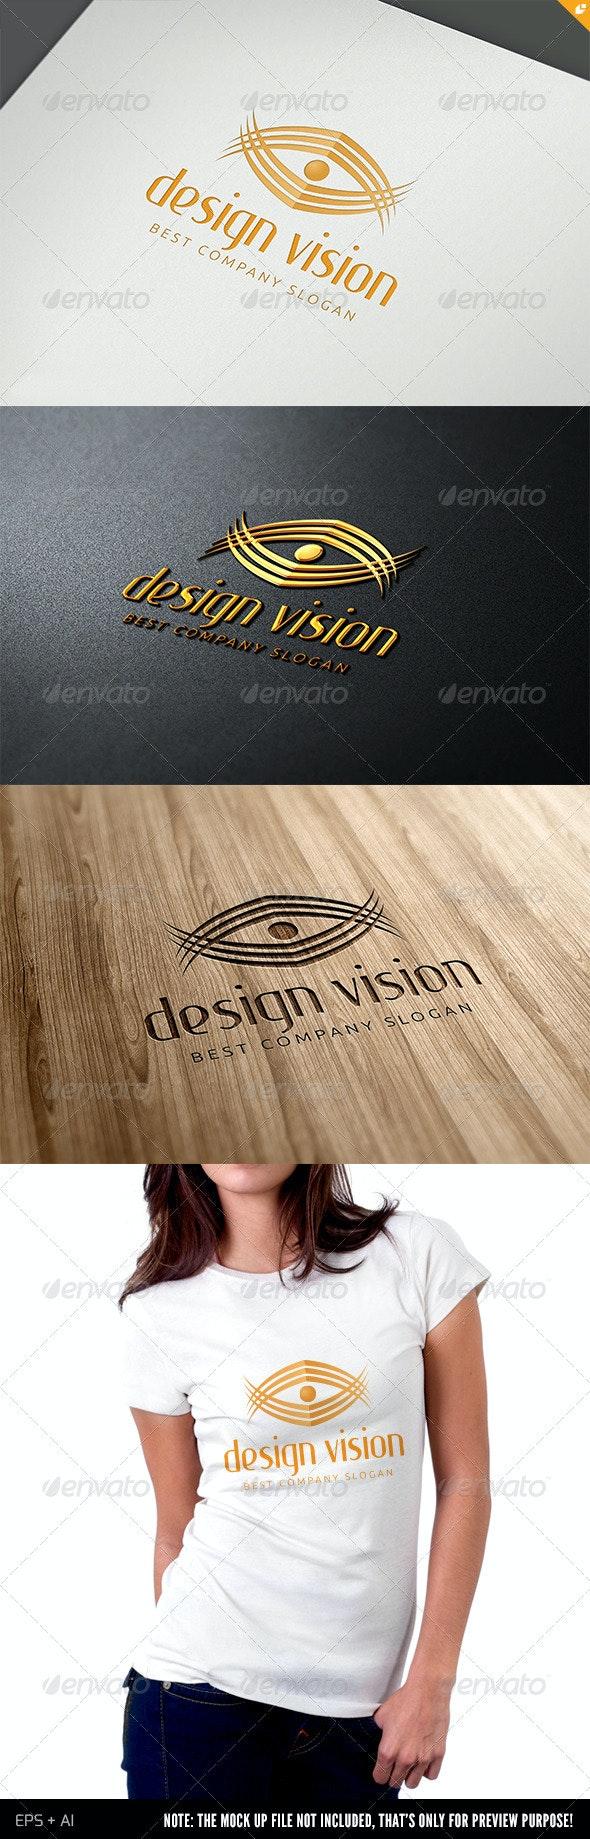 Media Design Vision Logo - Humans Logo Templates